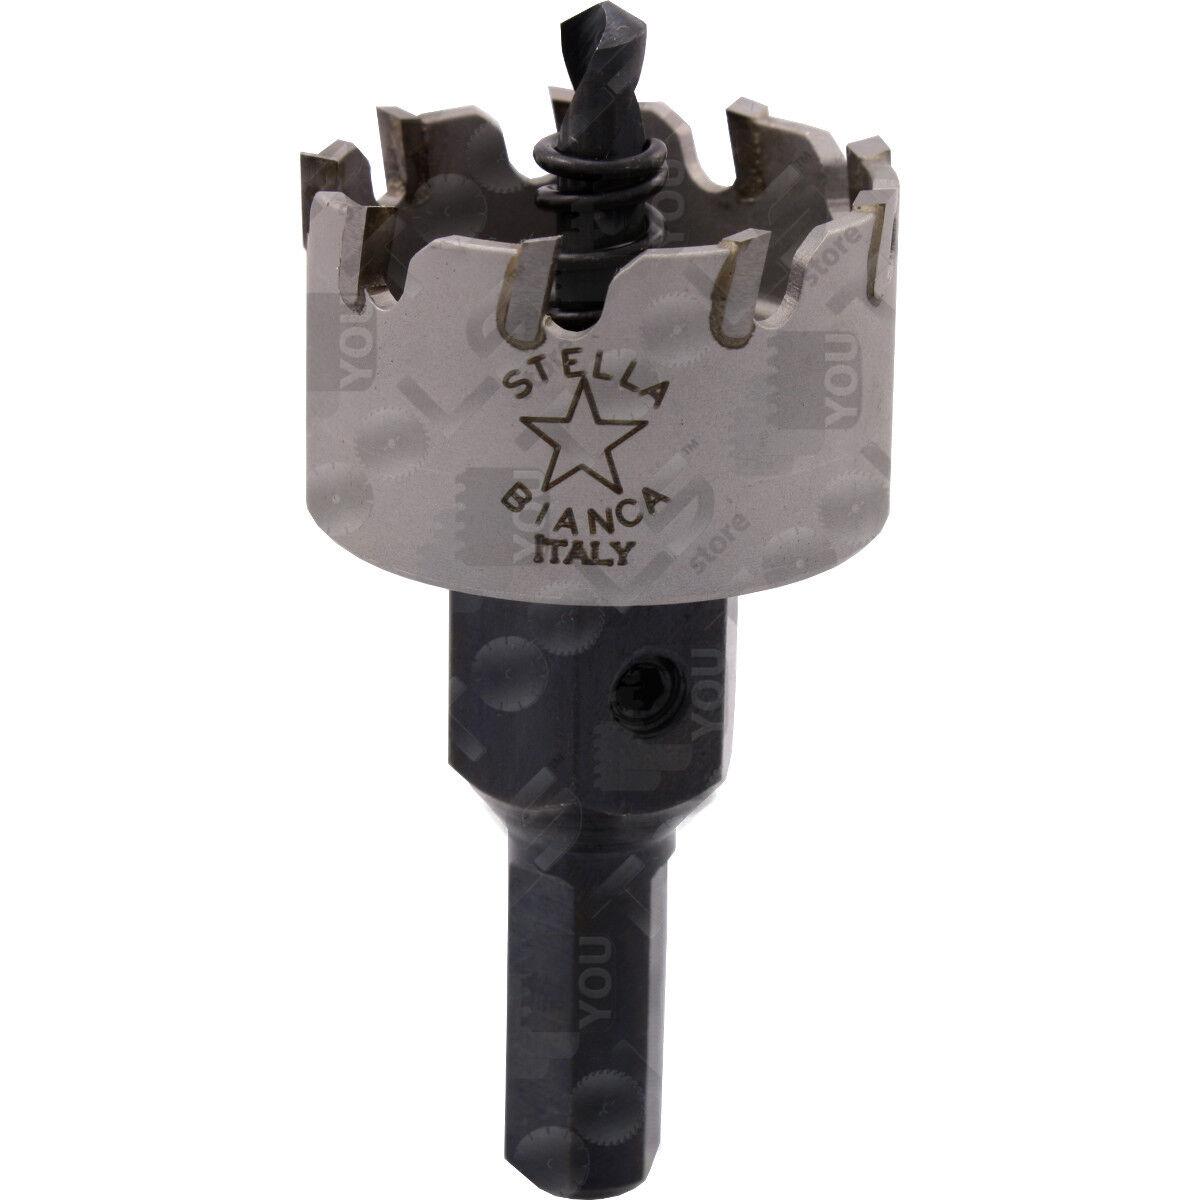 Fresa a tazza T.C.T. per Inox da Ø 15 a Ø 55 mm per ferro, metalli, acciaio inox